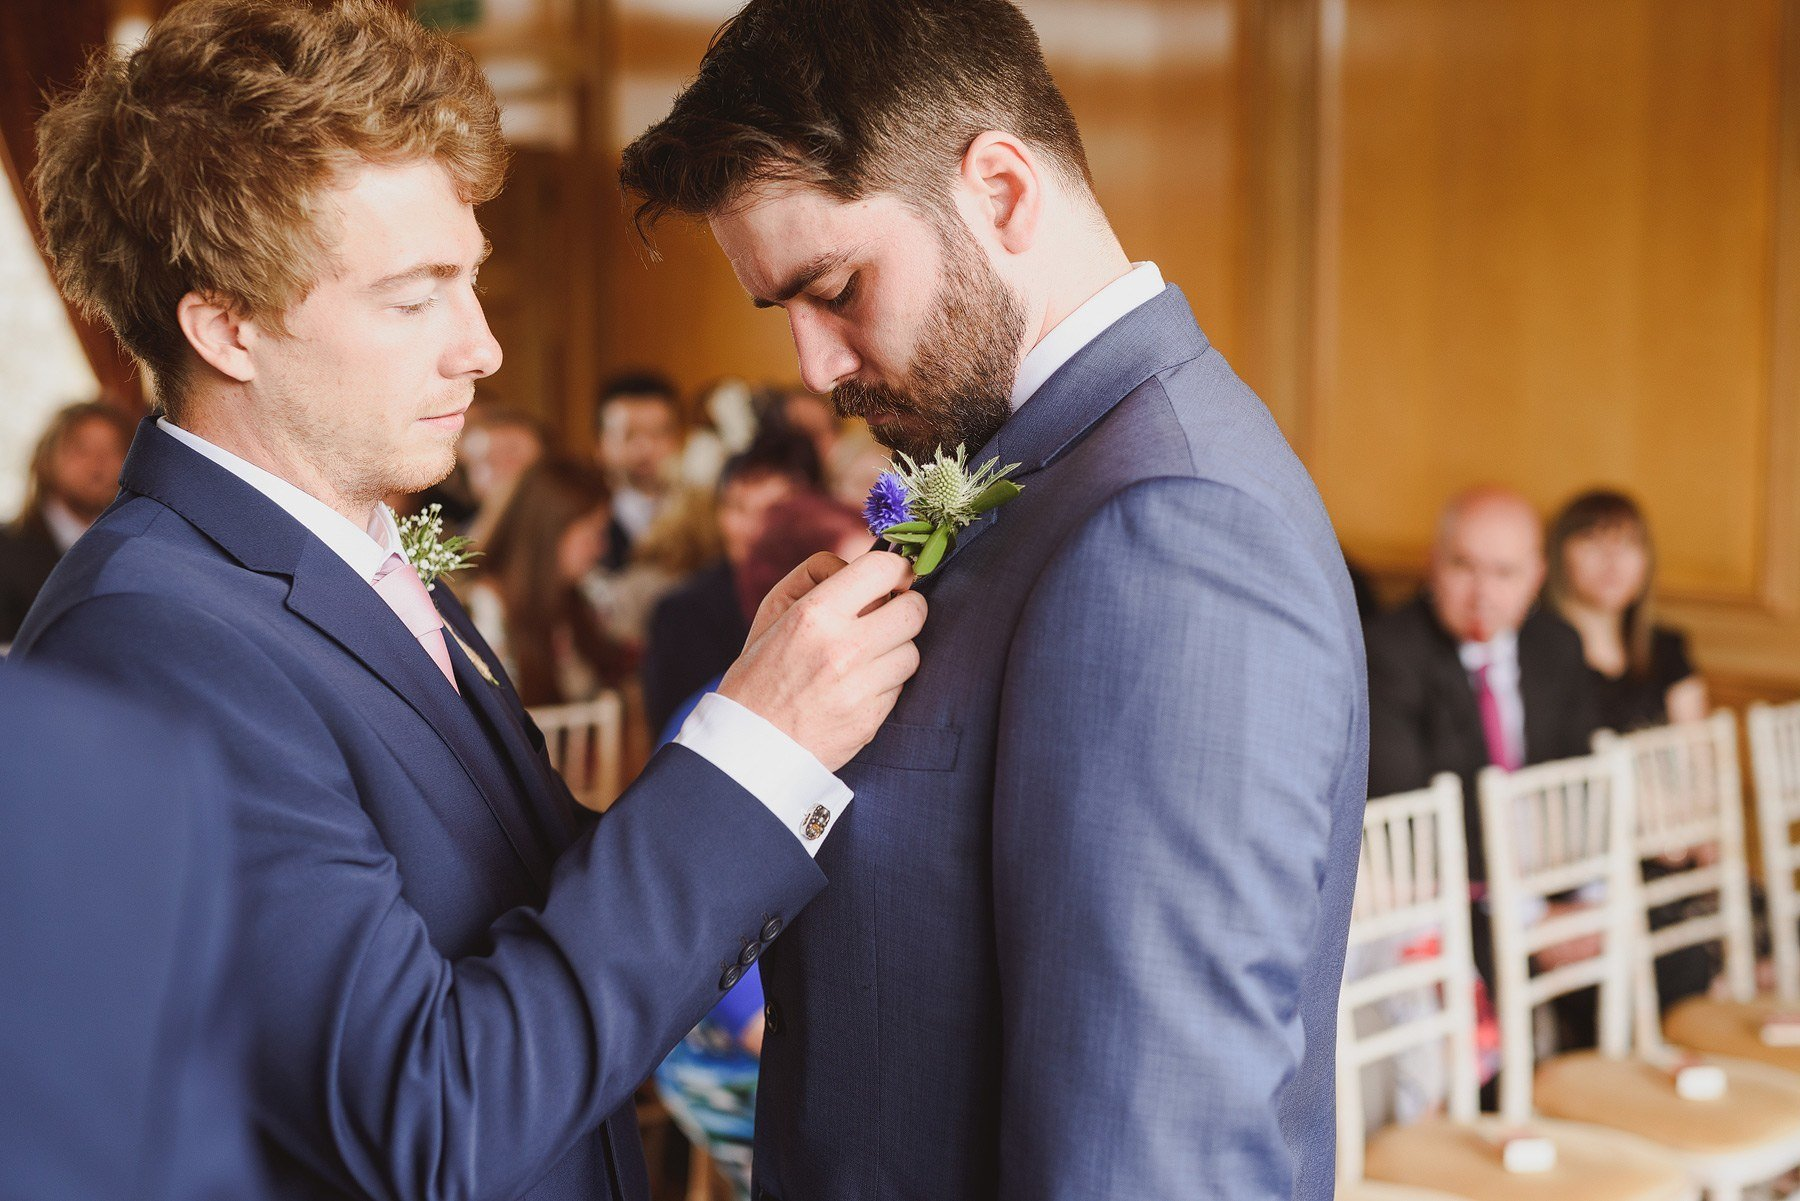 weddings at kilver court gardens